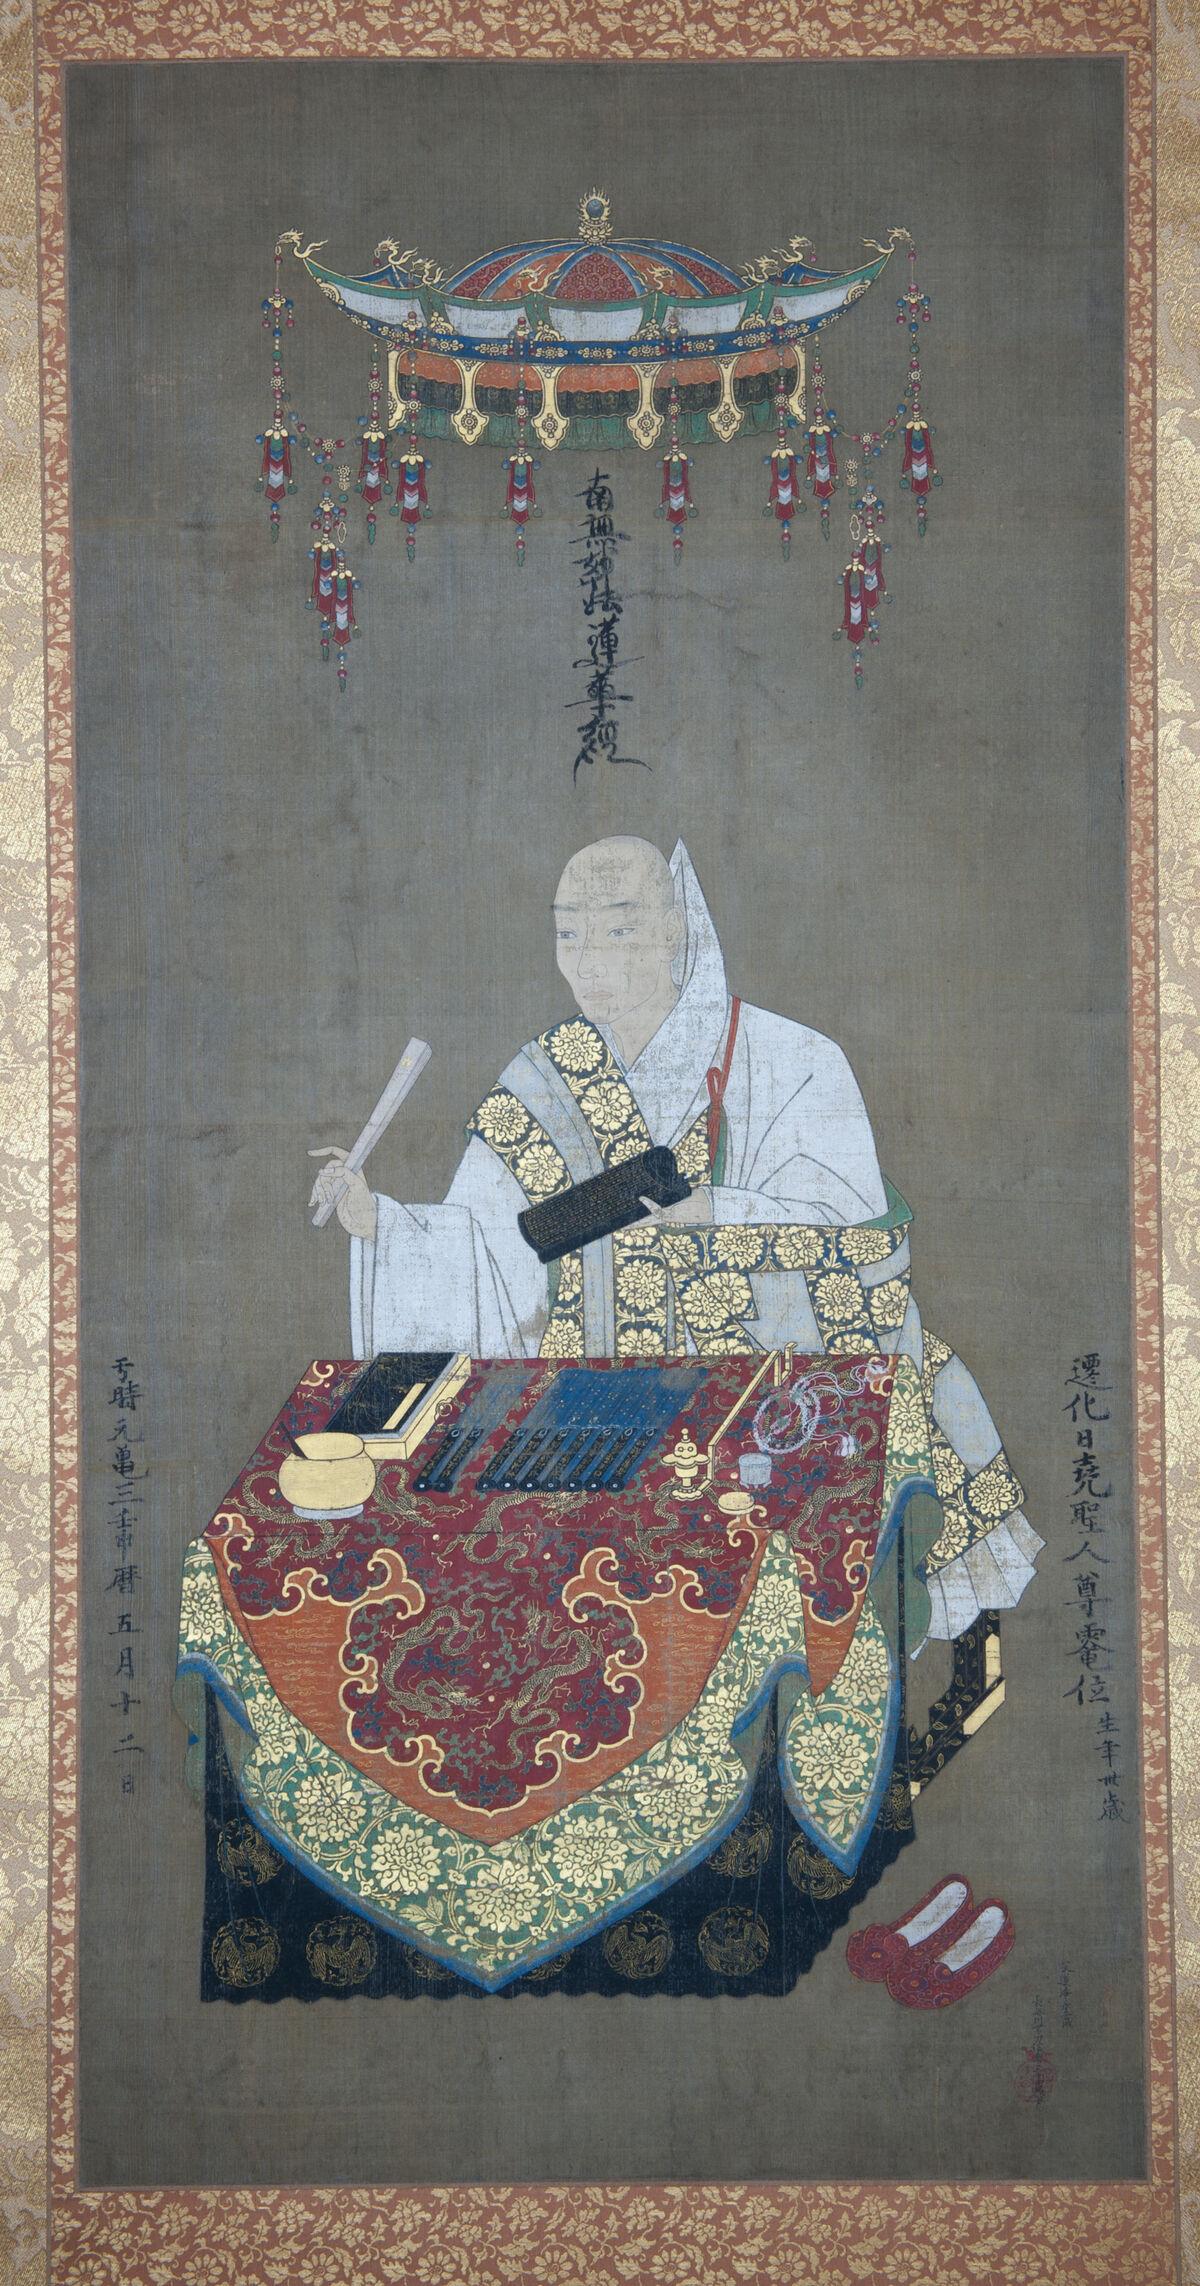 Hasegawa Tōhaku (Nobuharu), Portrait of Priest Nichigyō, 1572 (Momoyama period).